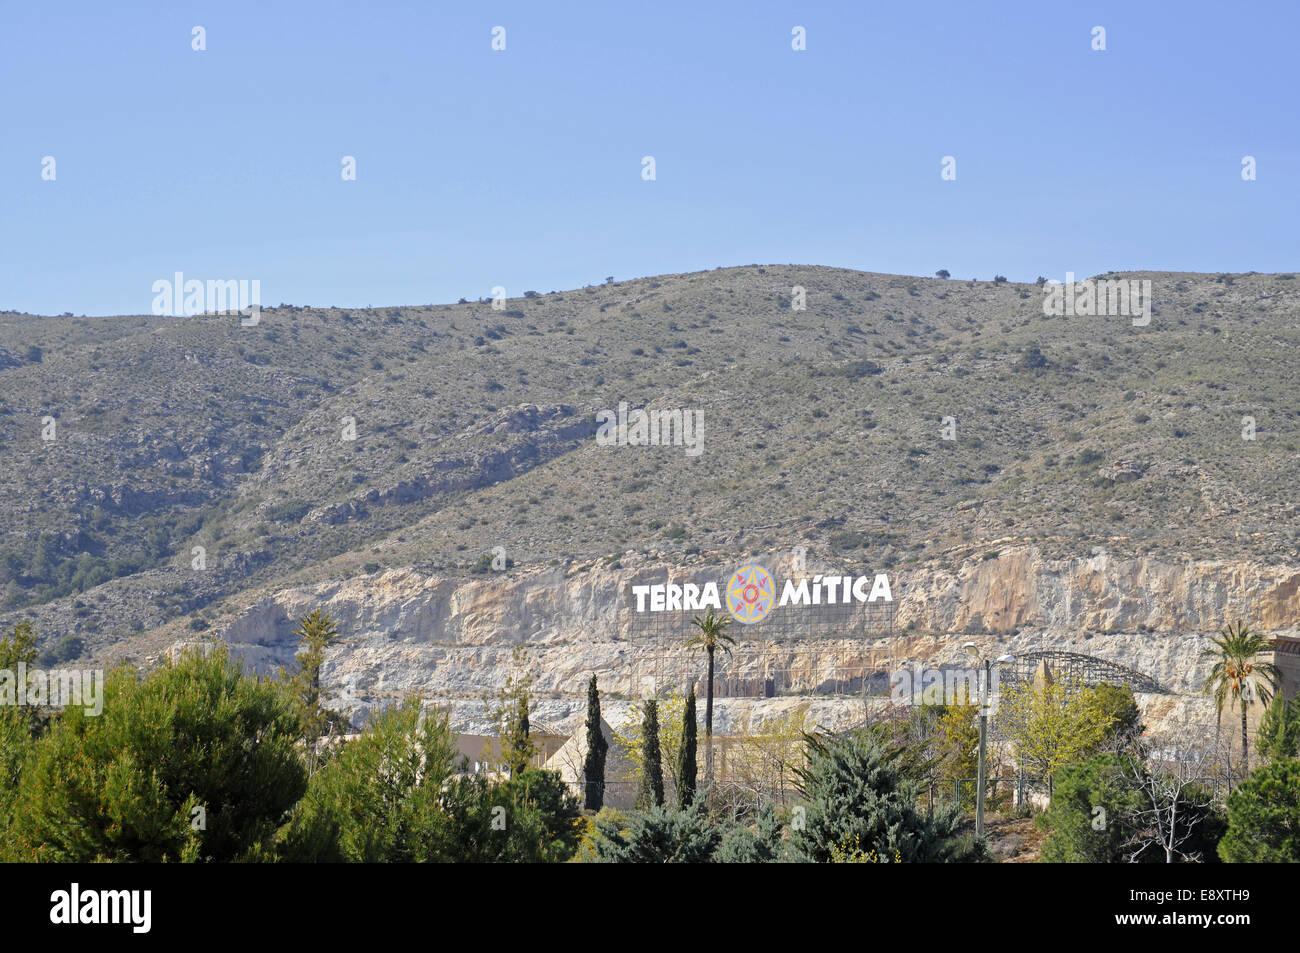 Terra Mitica - Stock Image